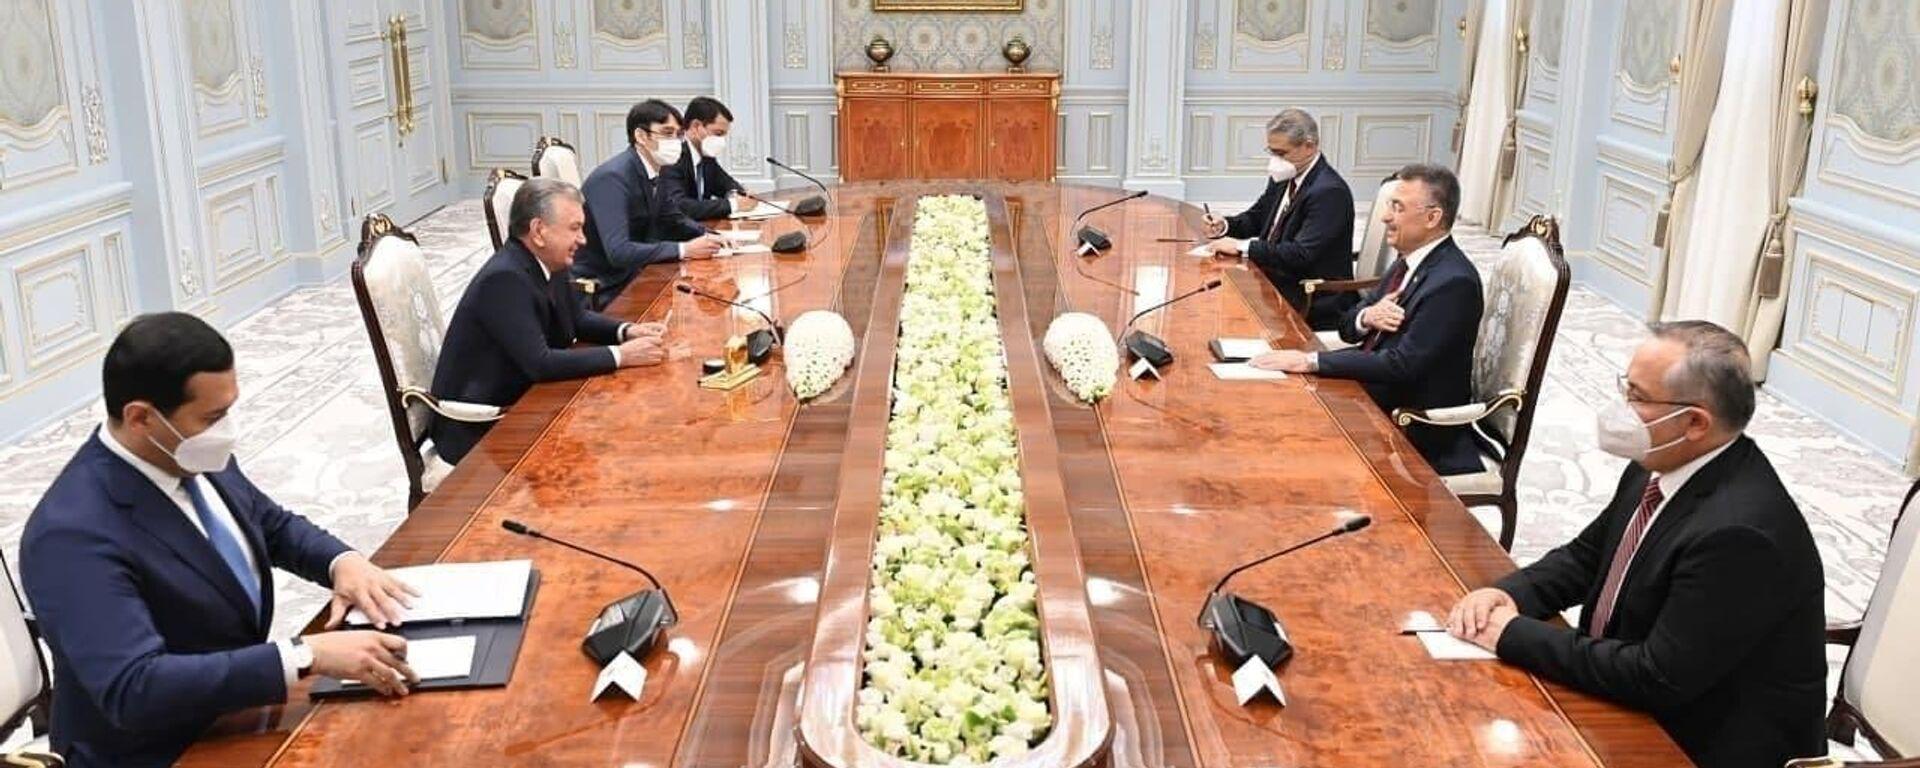 Шавкат Мирзиёев 28 июня принял вице-президента Турецкой Республики Фуата Октая - Sputnik Узбекистан, 1920, 28.06.2021